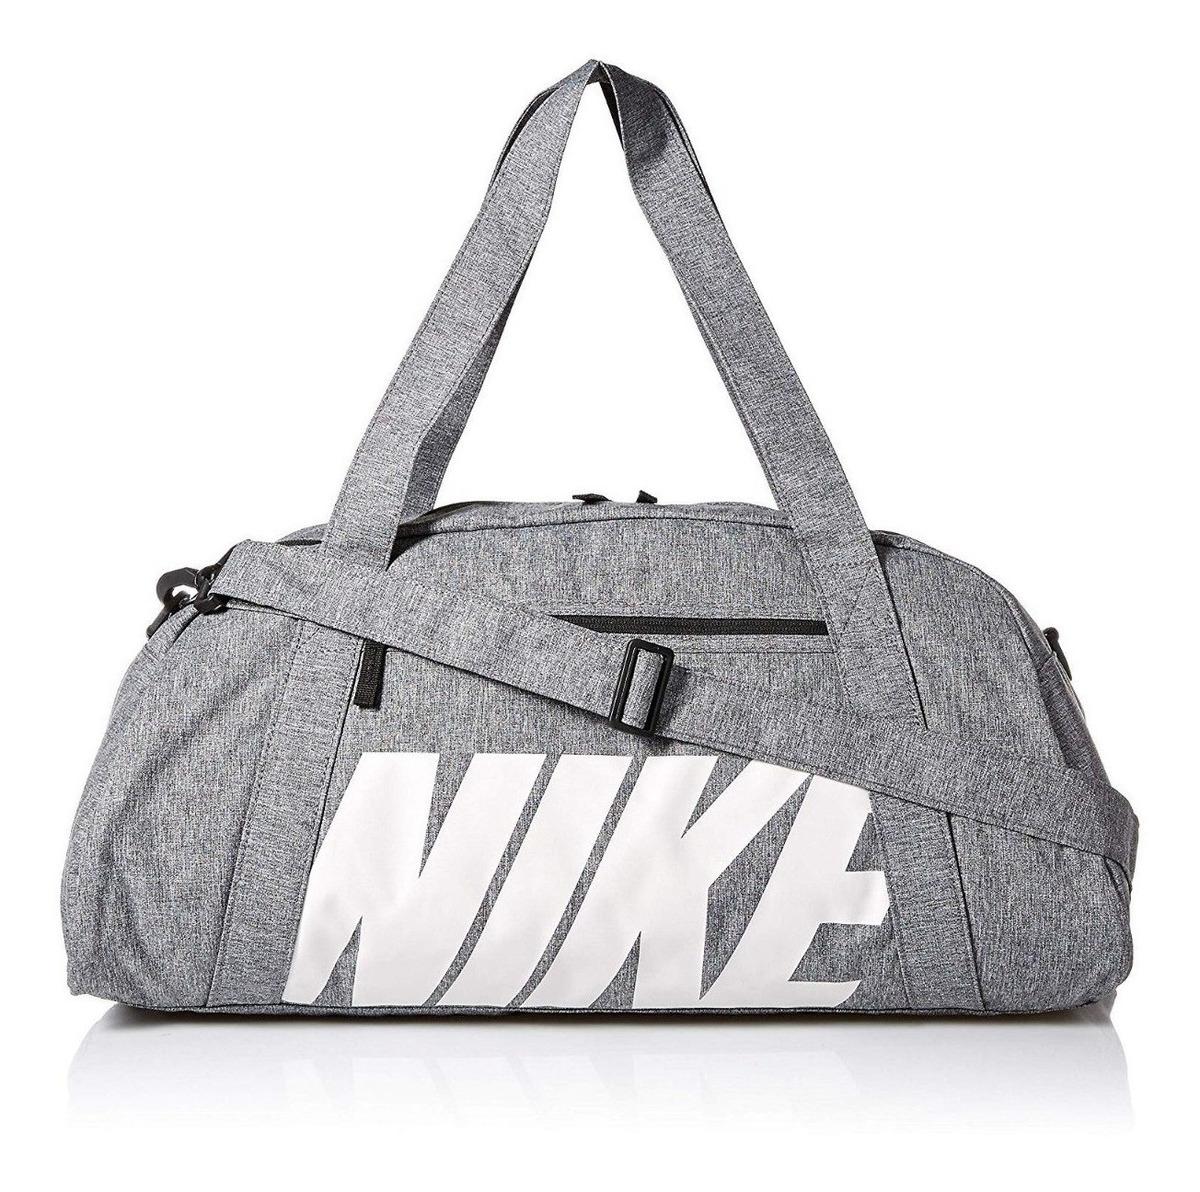 De Gym Mochilas Deportes Gimnasio Nike Viaje Maleta Mano 7bf6gy